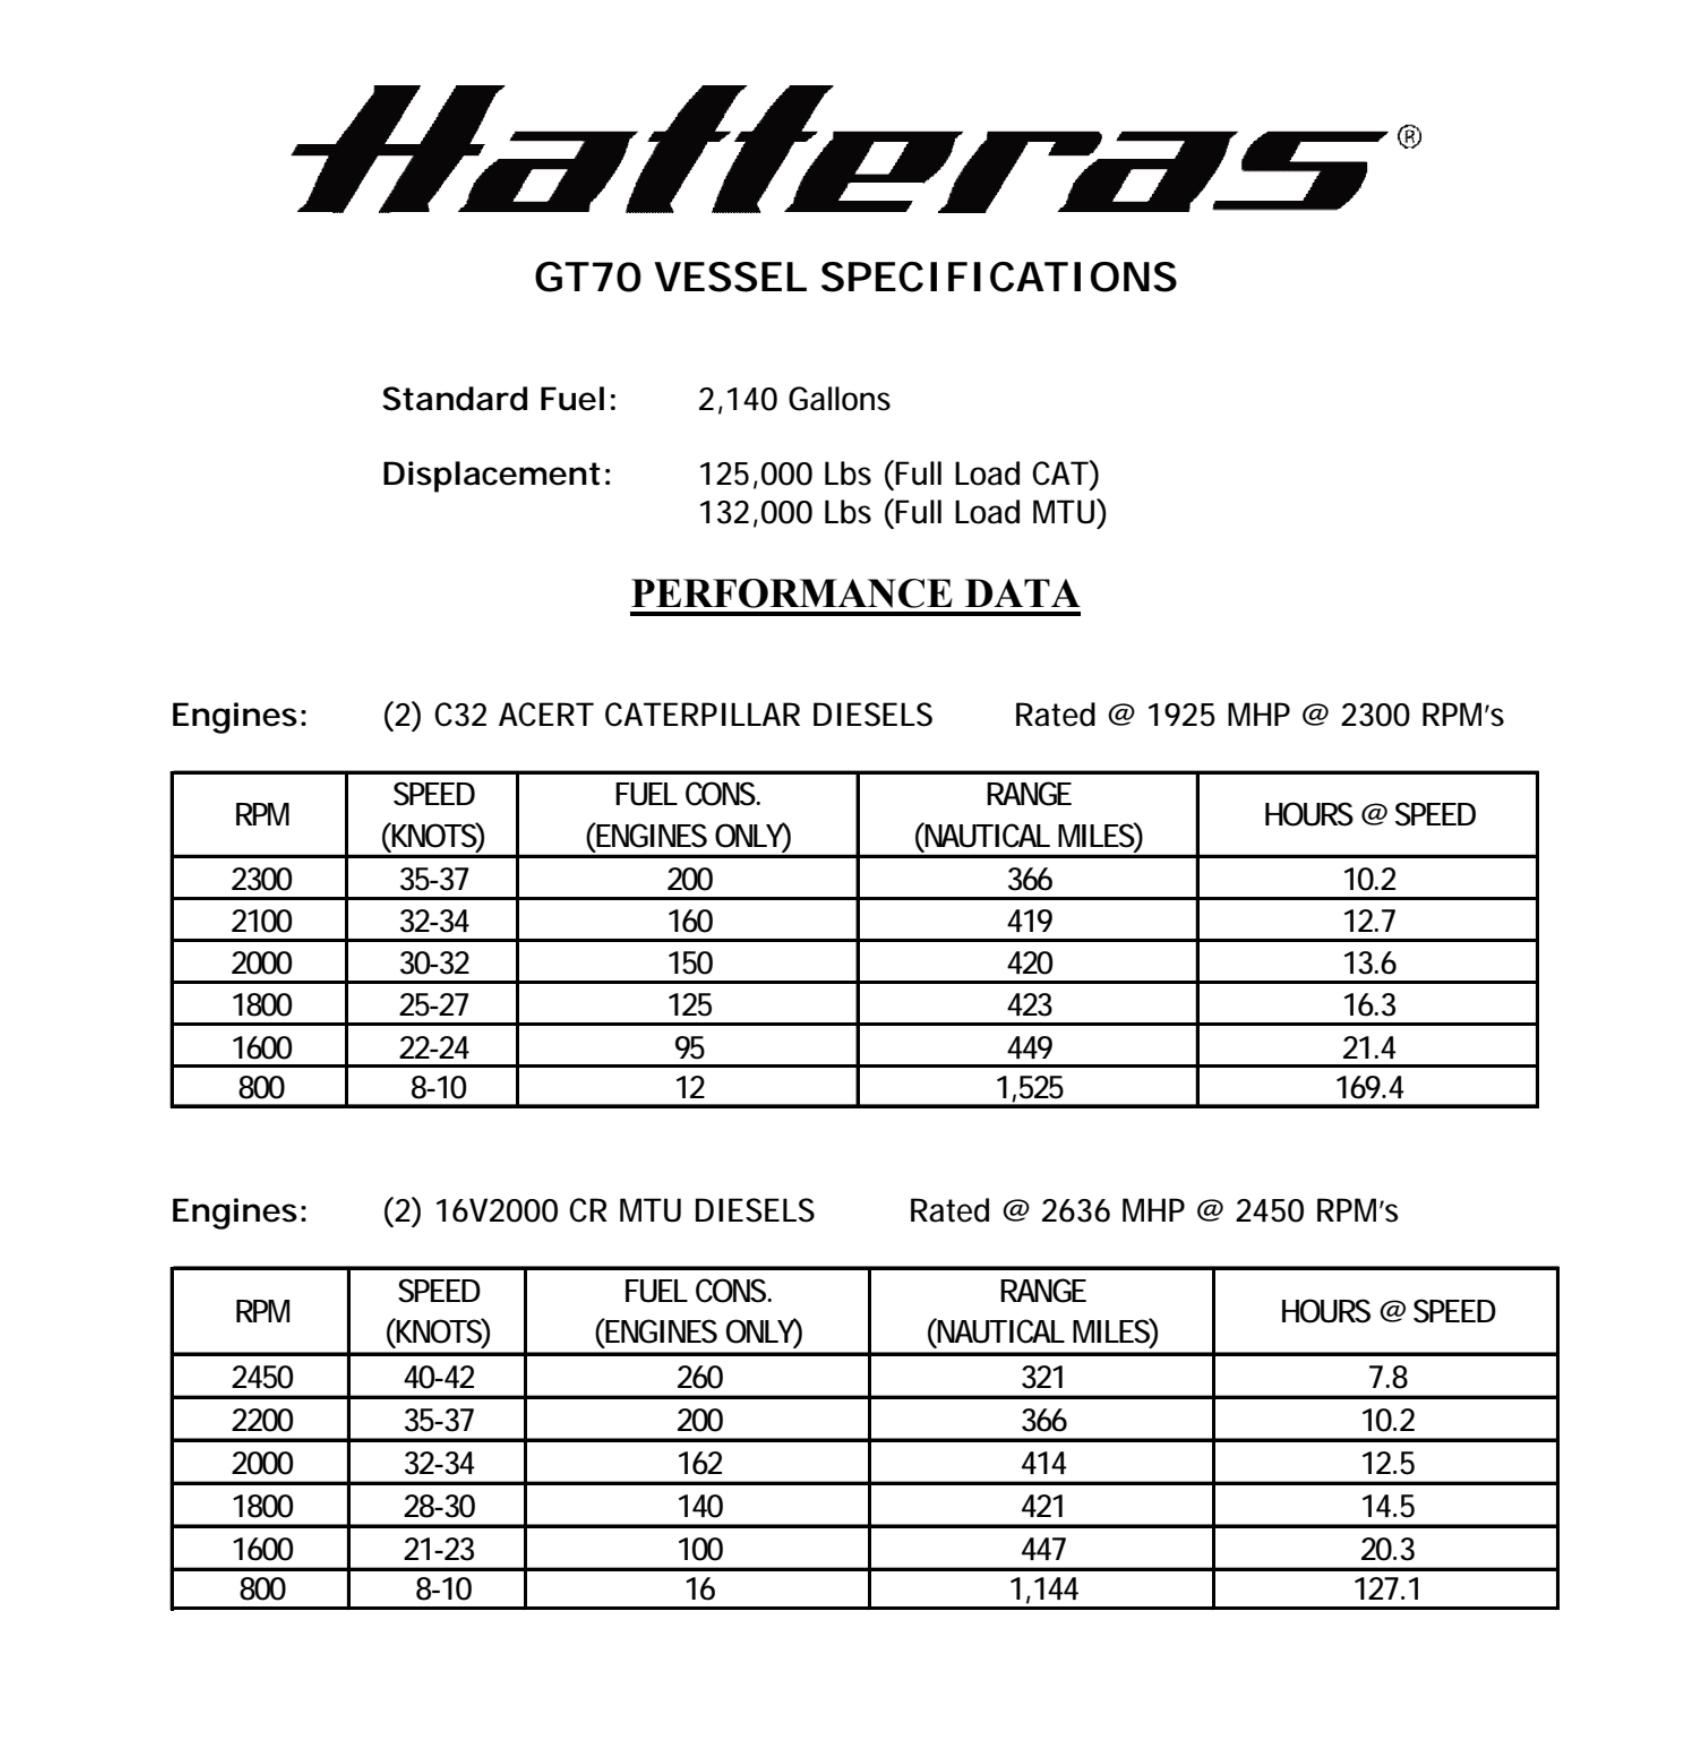 Hatteras GT70 Performance Data 1